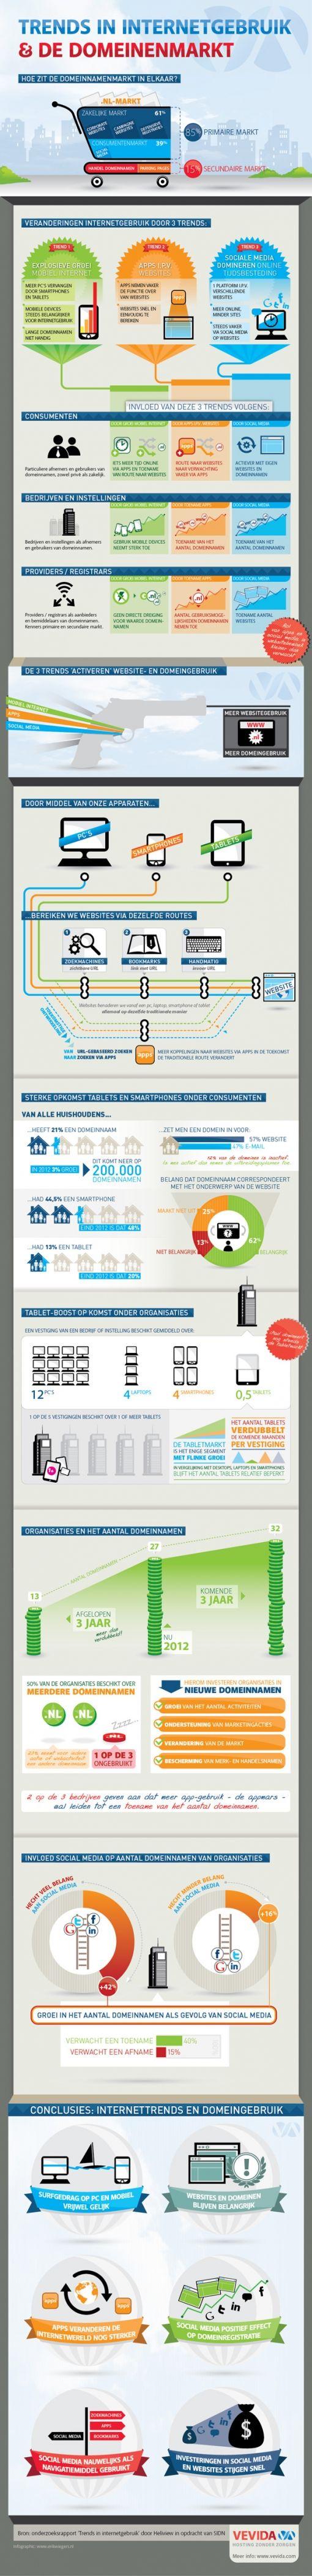 vevida_infographic_599px